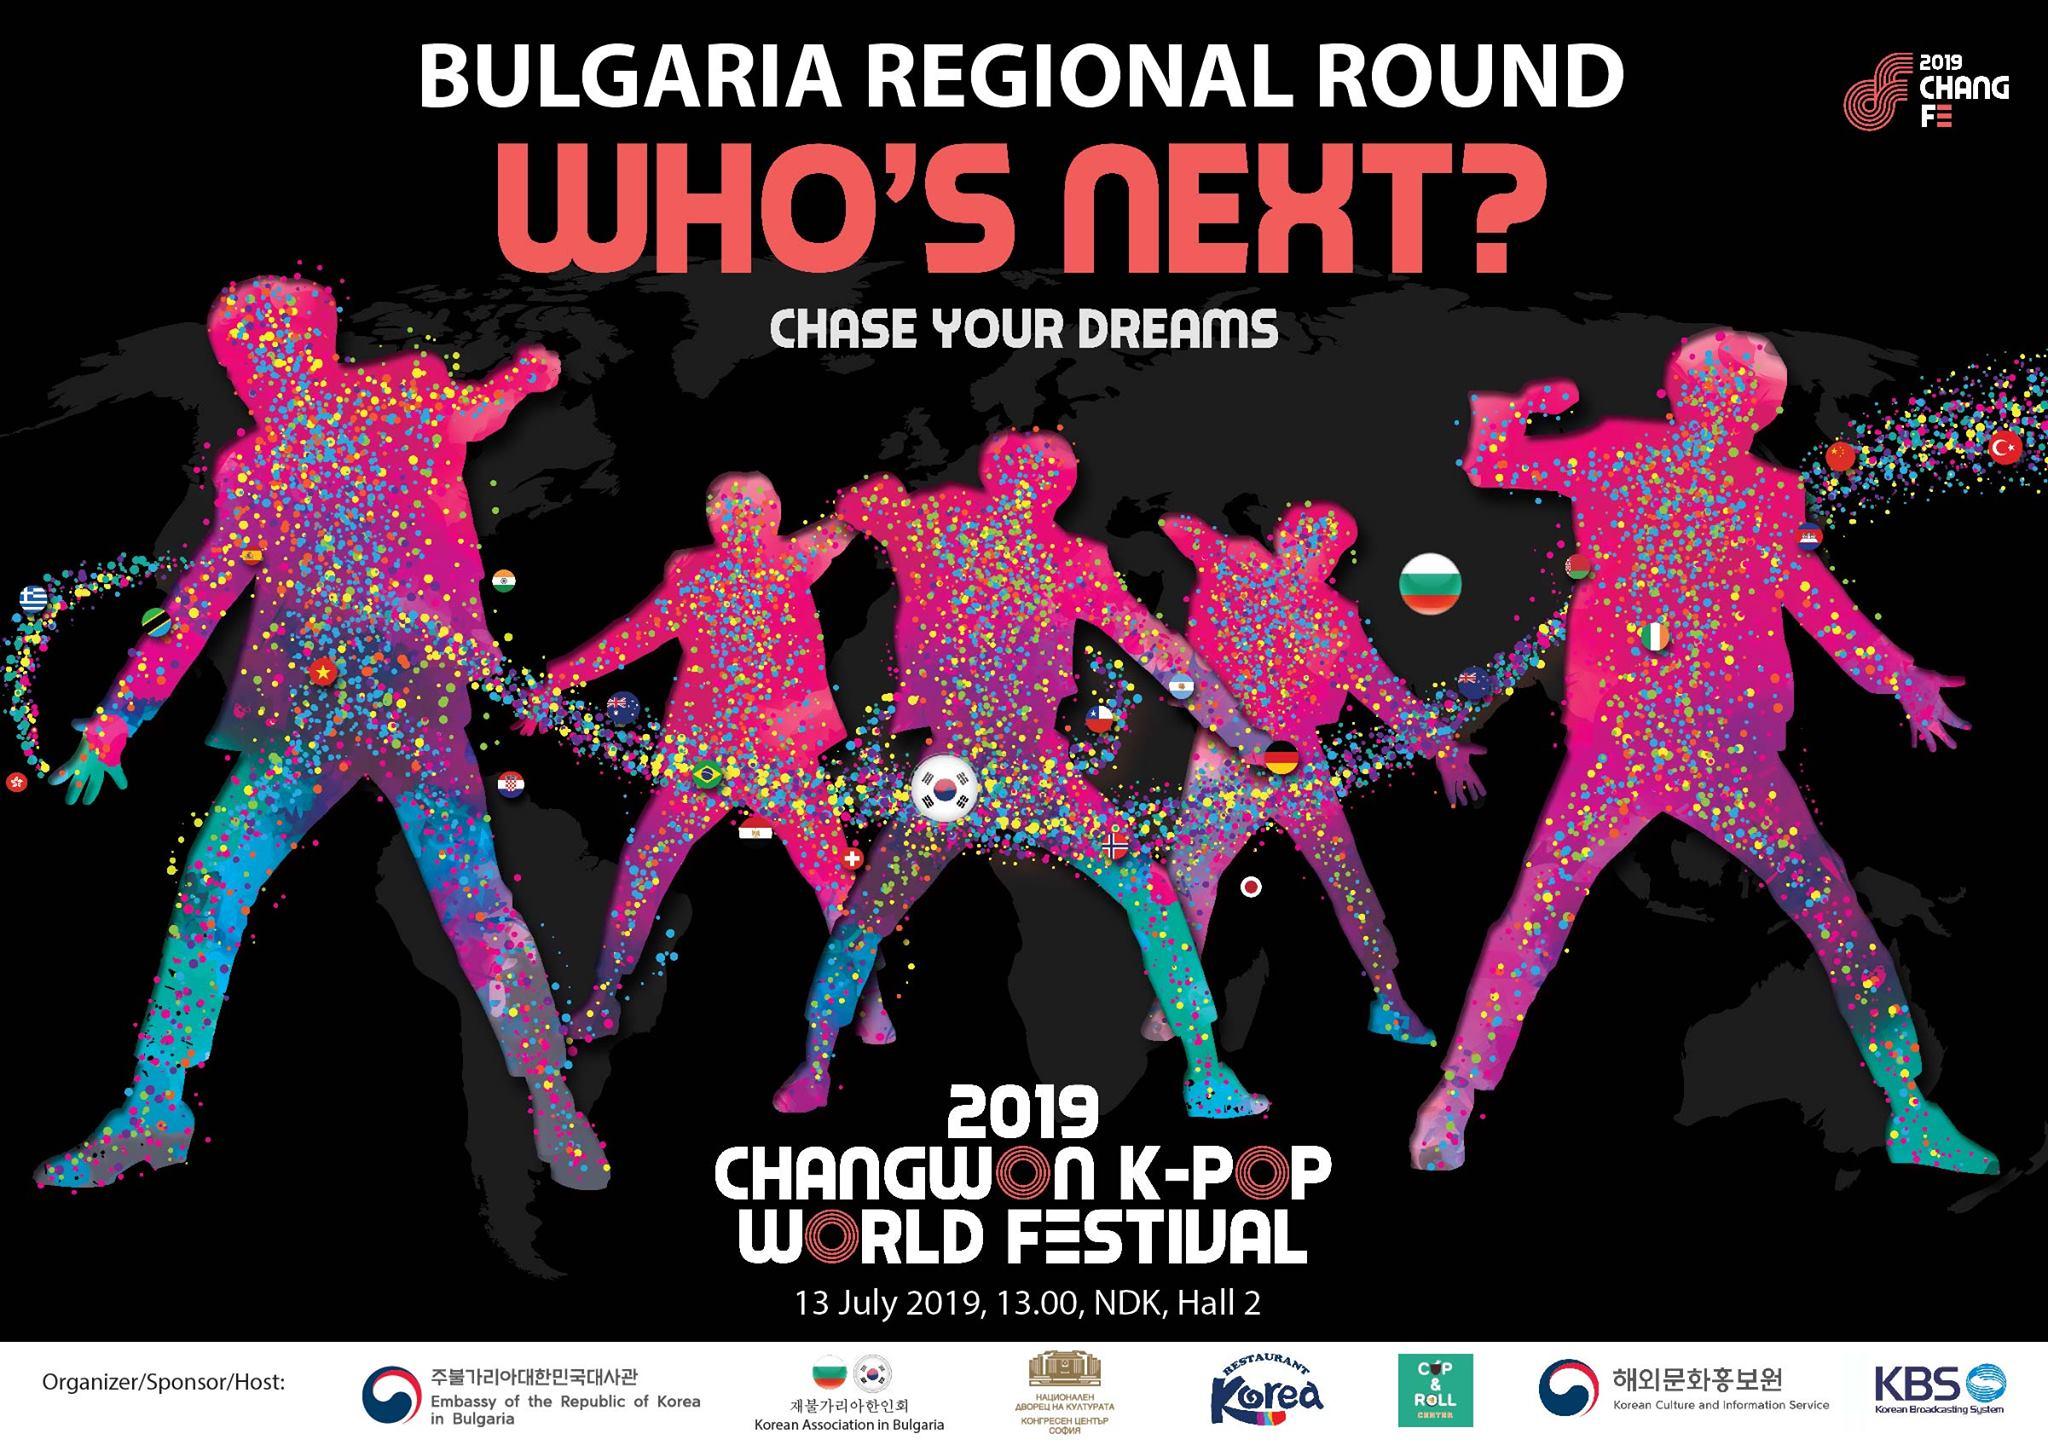 K-pop World Festival 2019 in Bulgaria - True East Asia